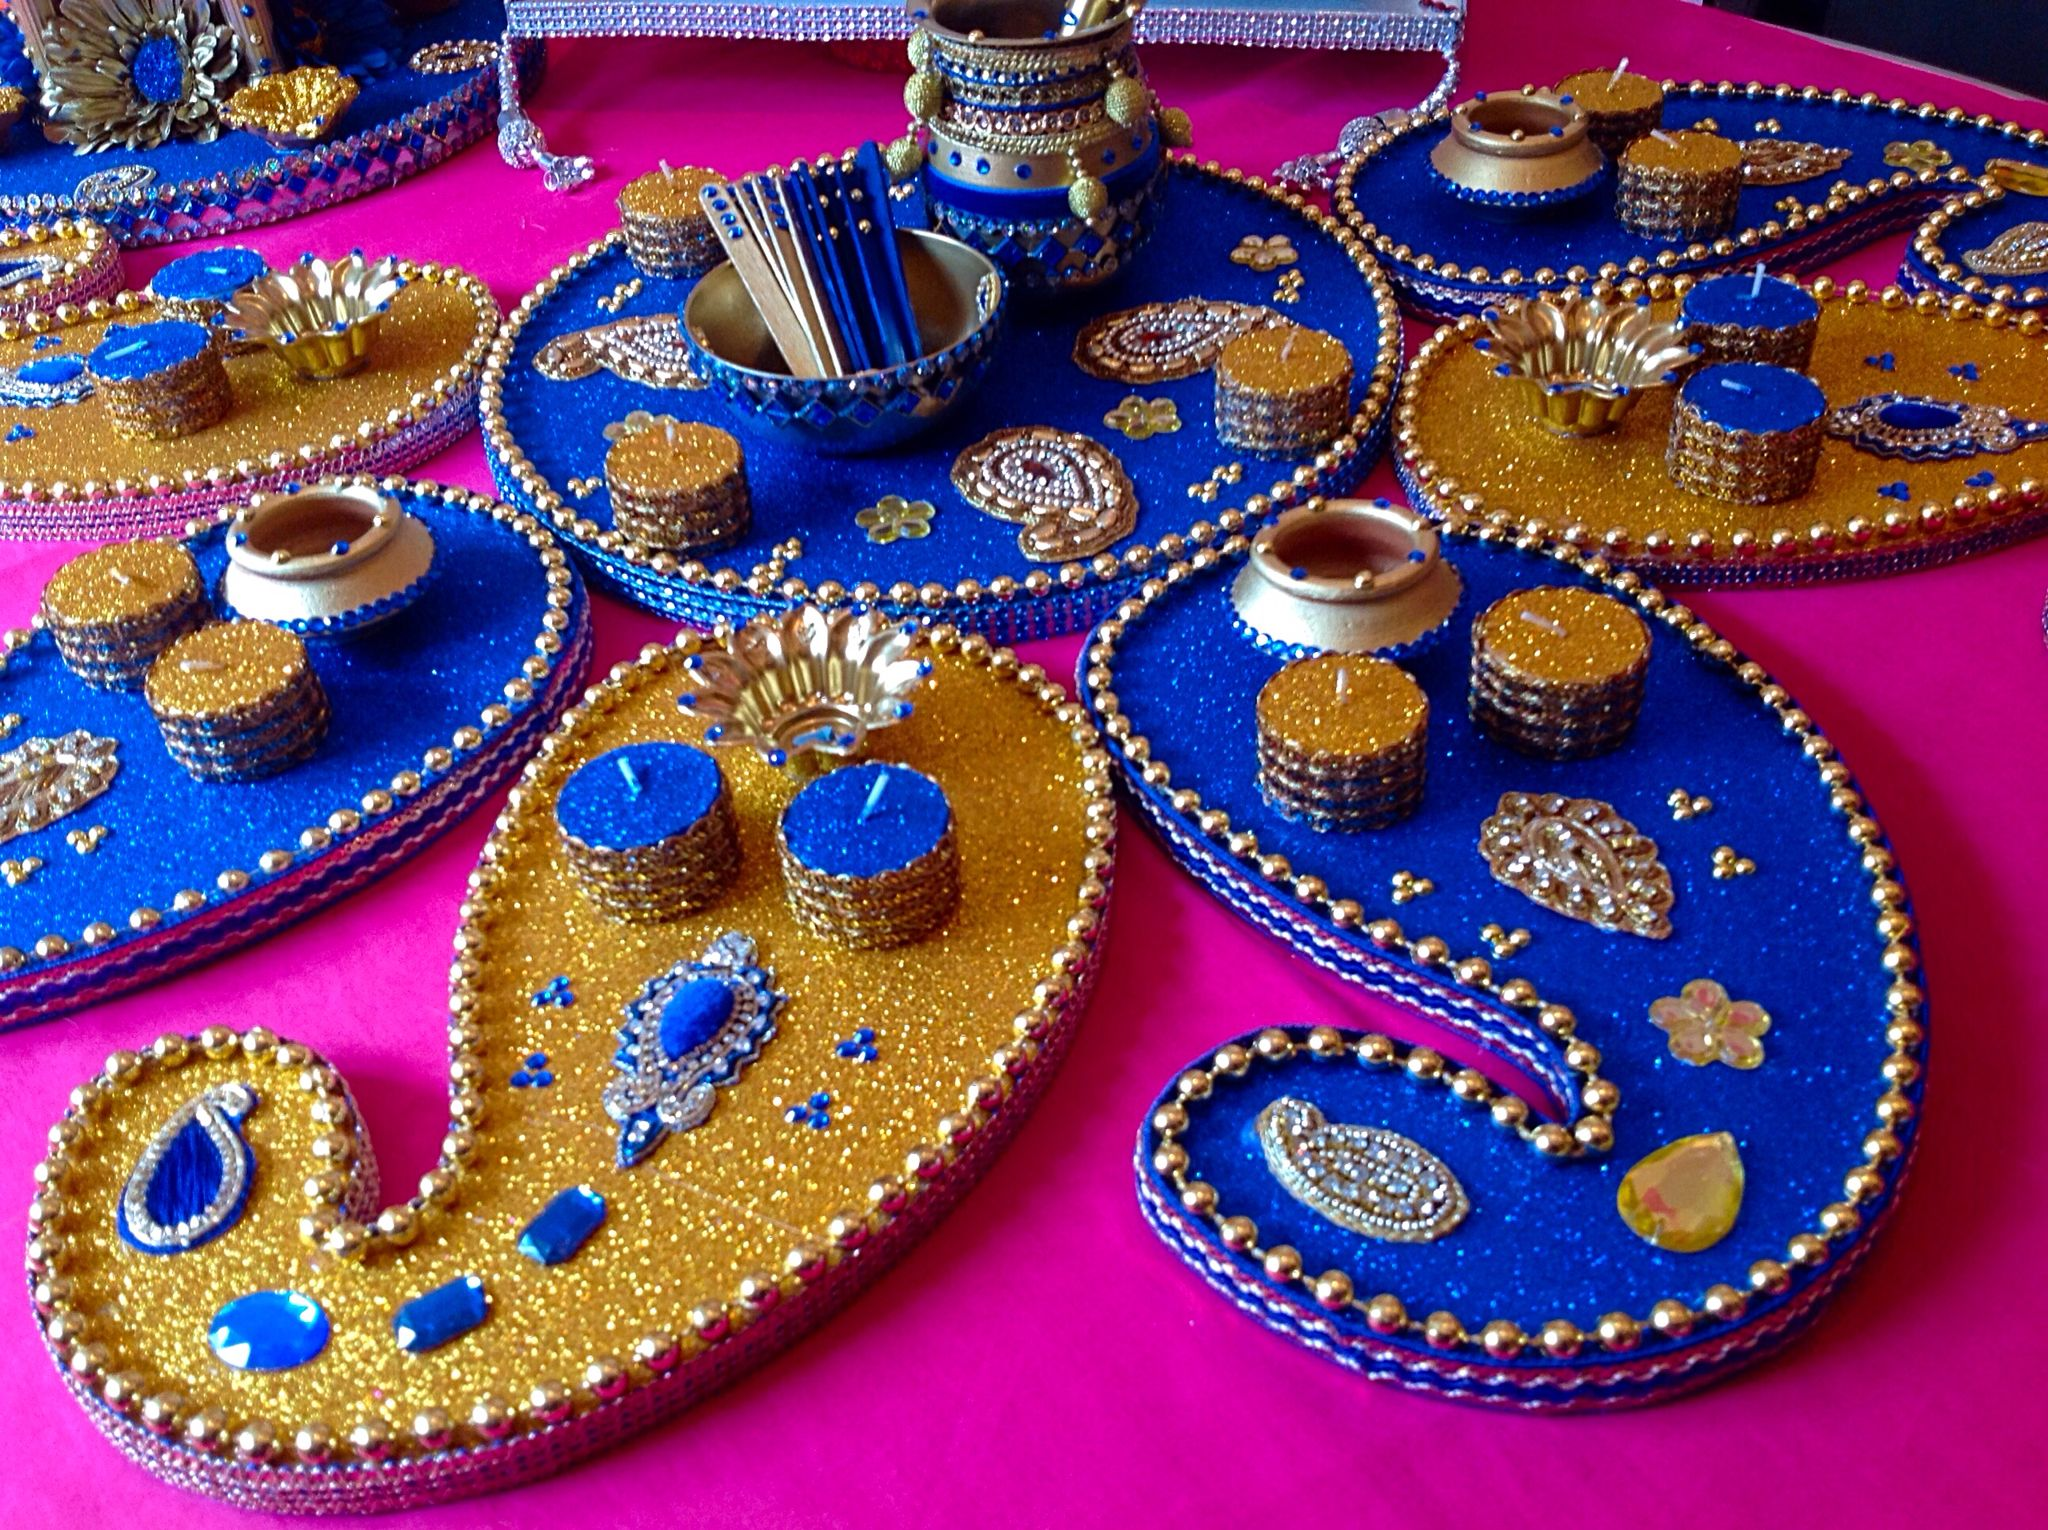 Mehndi Decor Supplies : Royal blue and gold elegant mehndi plates see